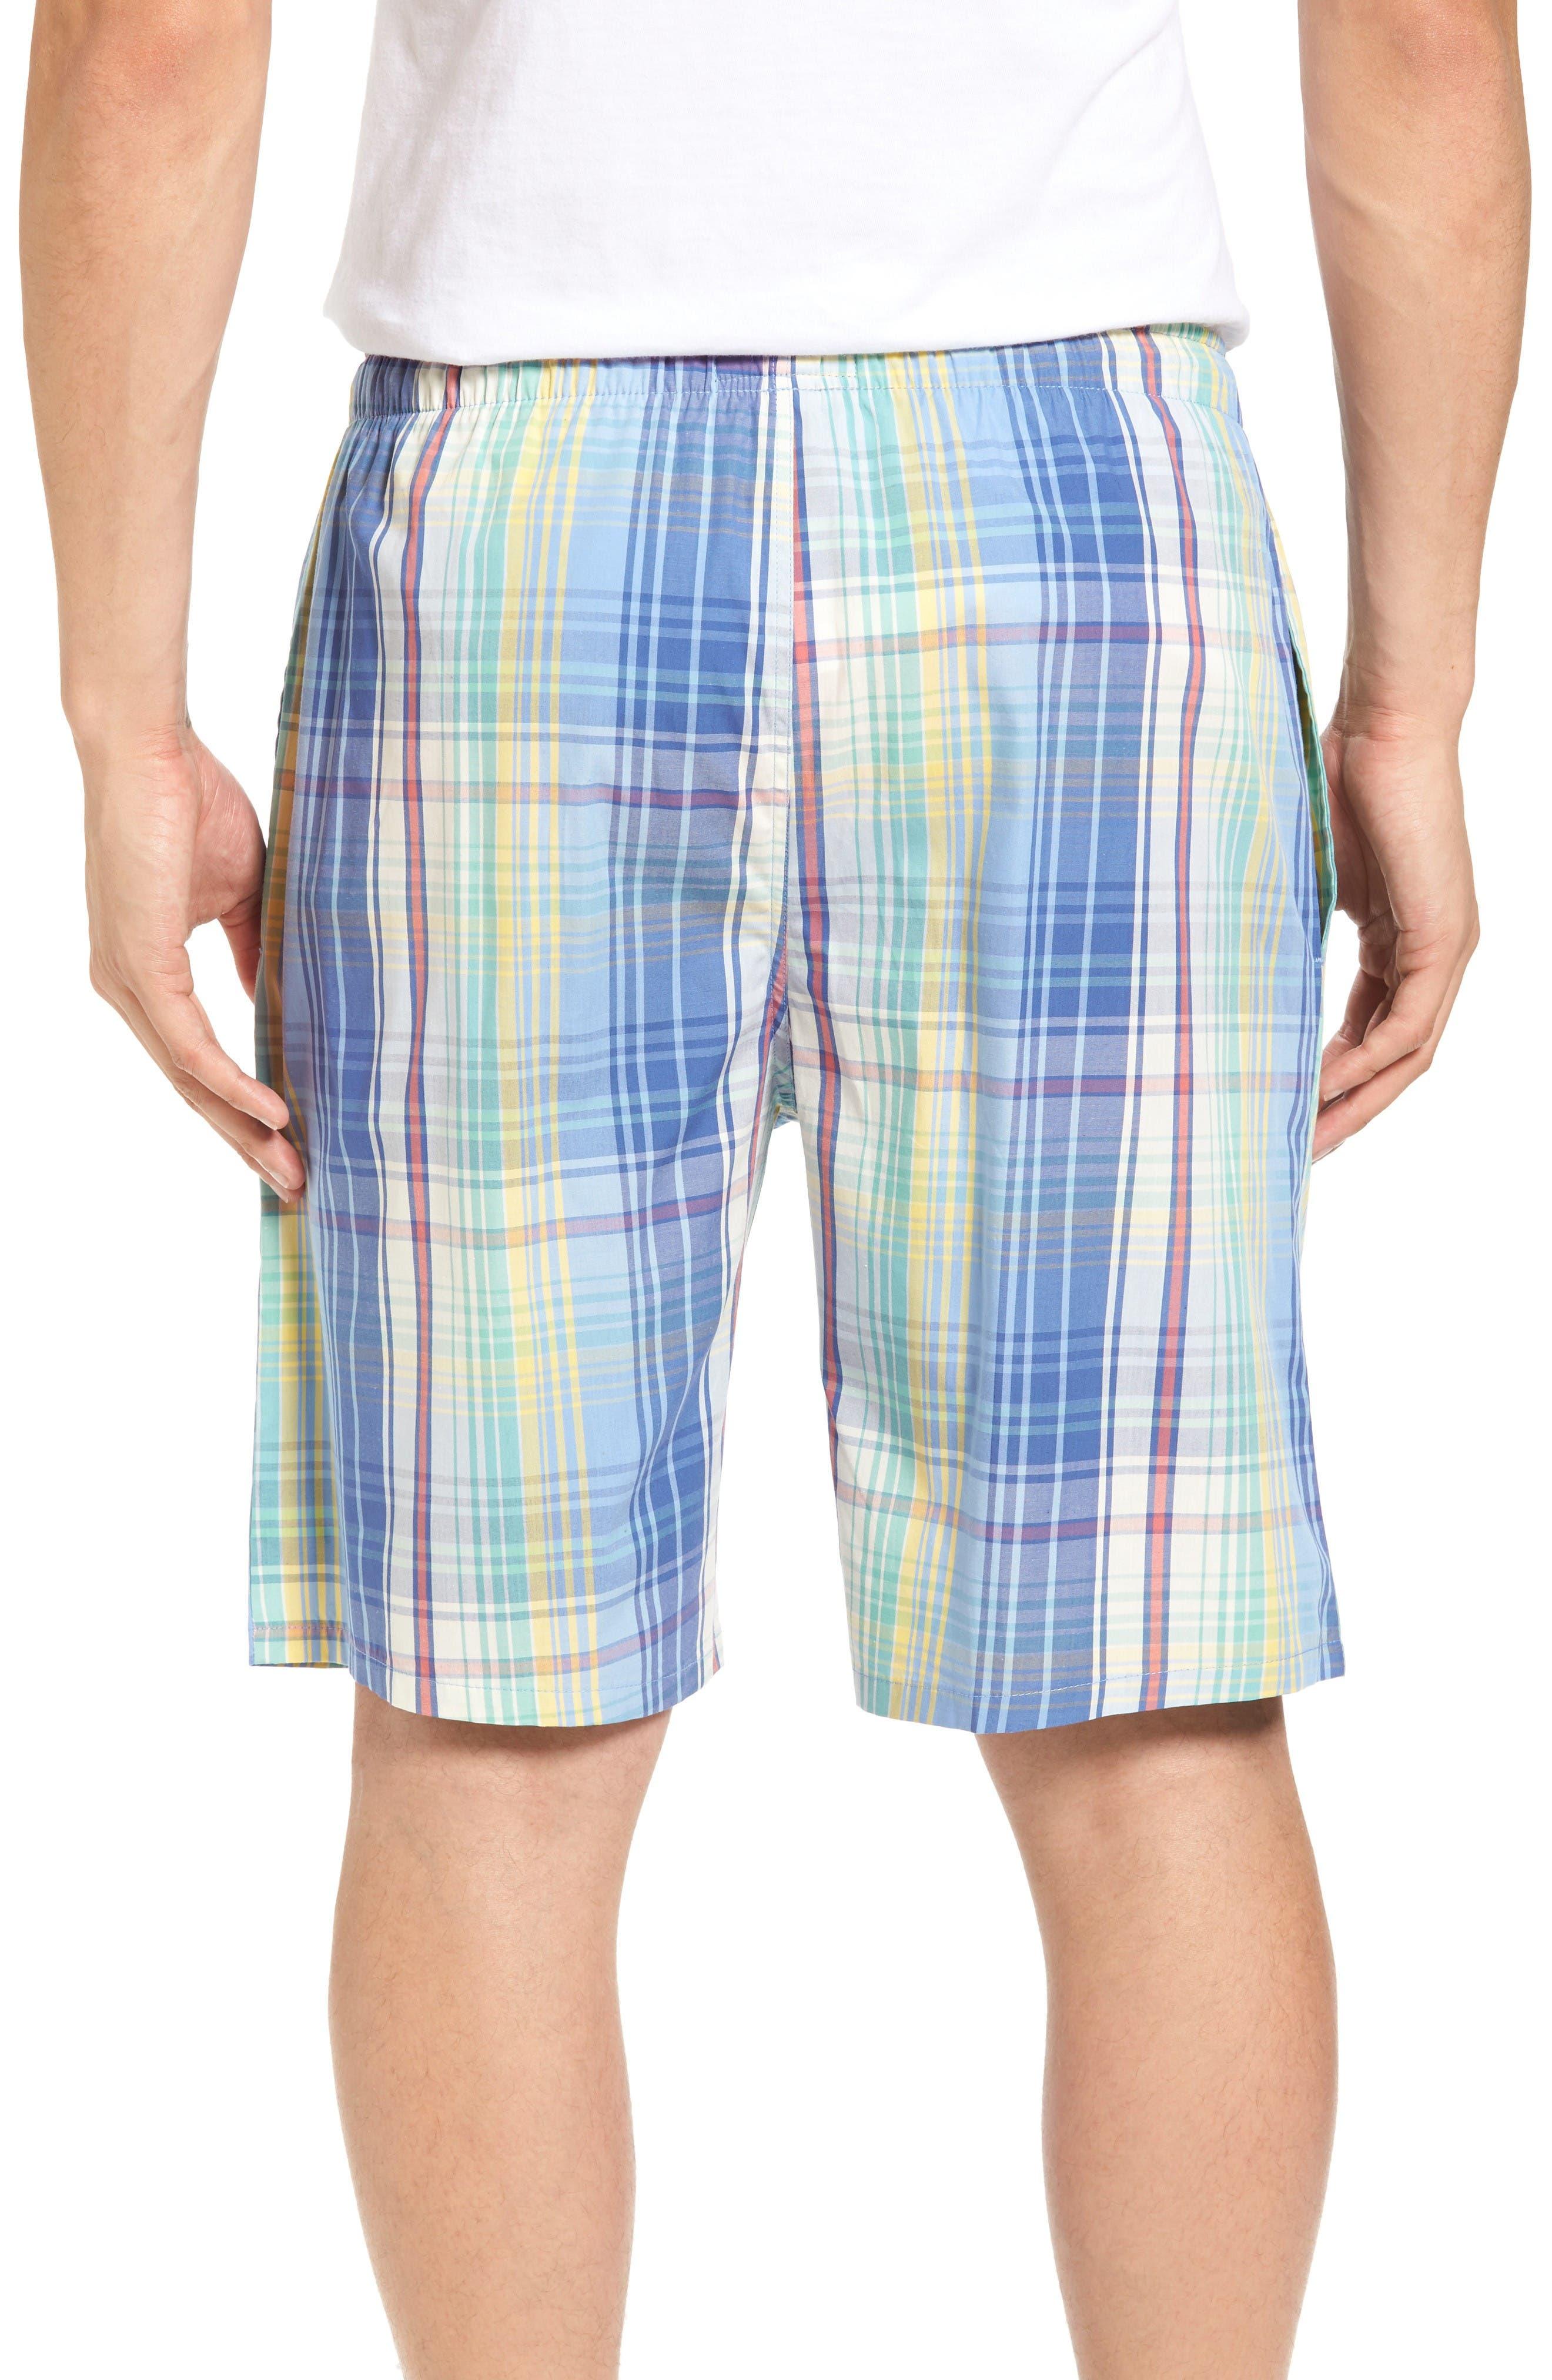 Cotton Pajama Shorts,                             Alternate thumbnail 2, color,                             Avery Plaid